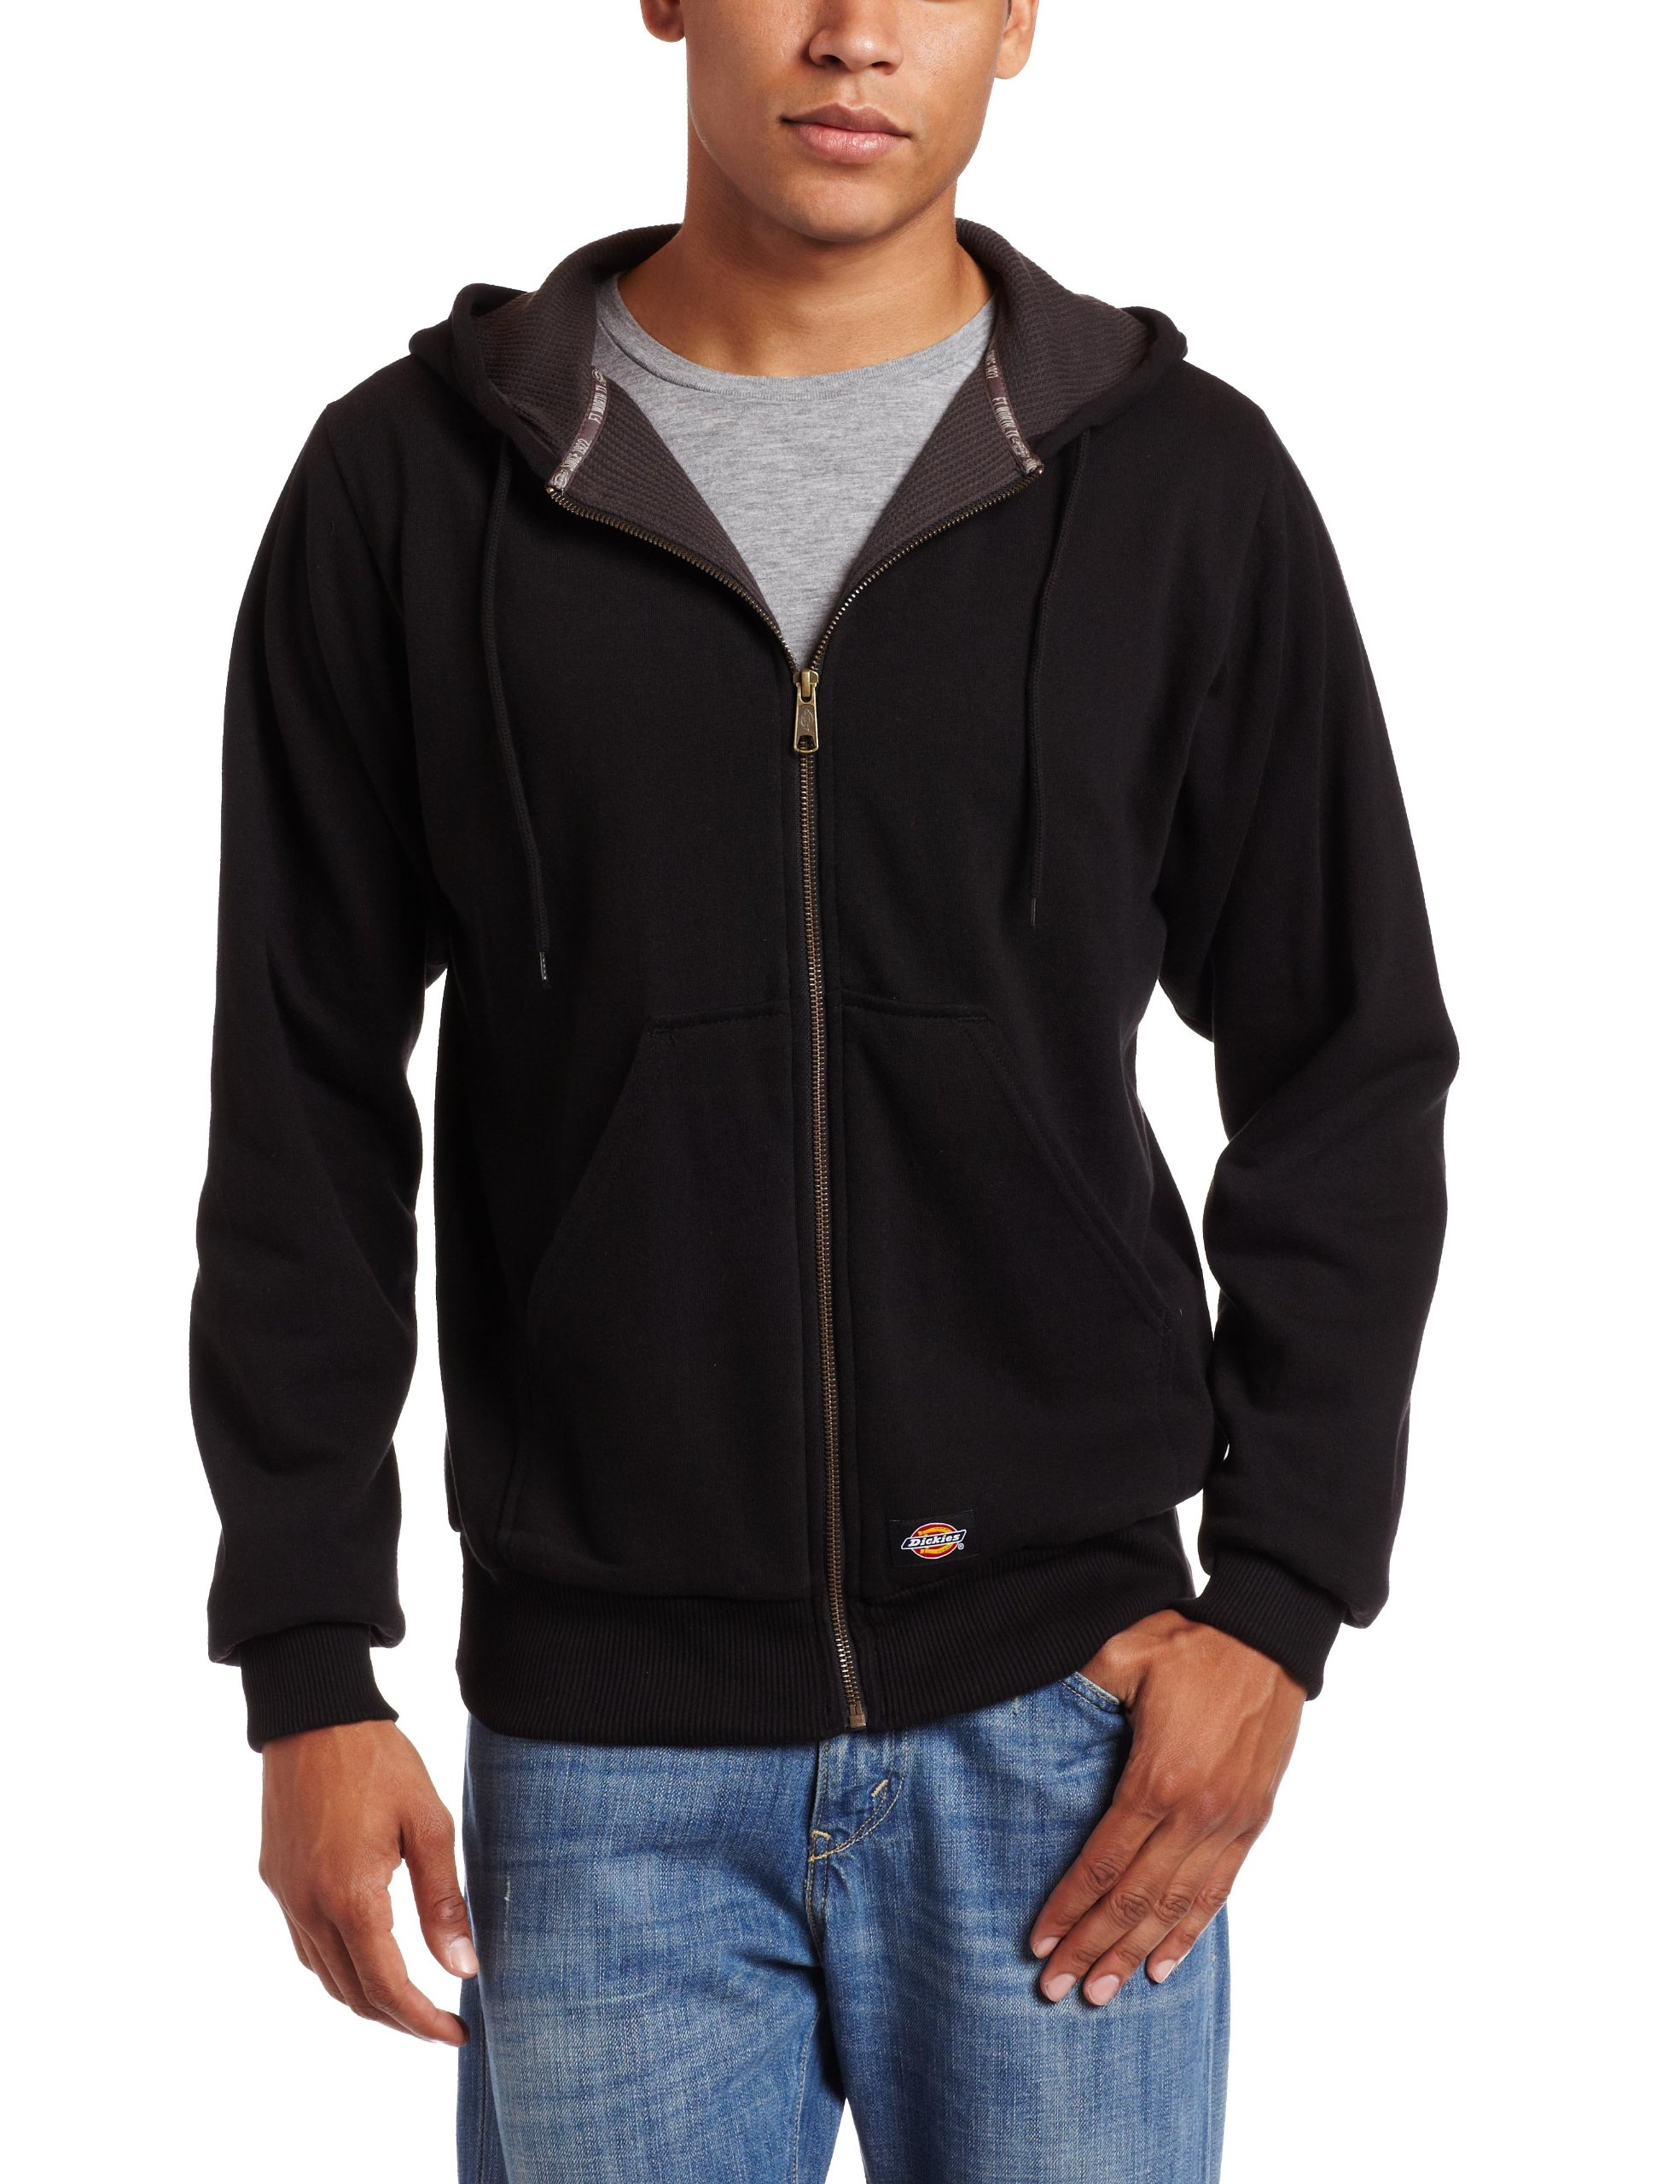 d2a5ef719 Best Rated in Men s Fleece Jackets   Coats   Helpful Customer ...